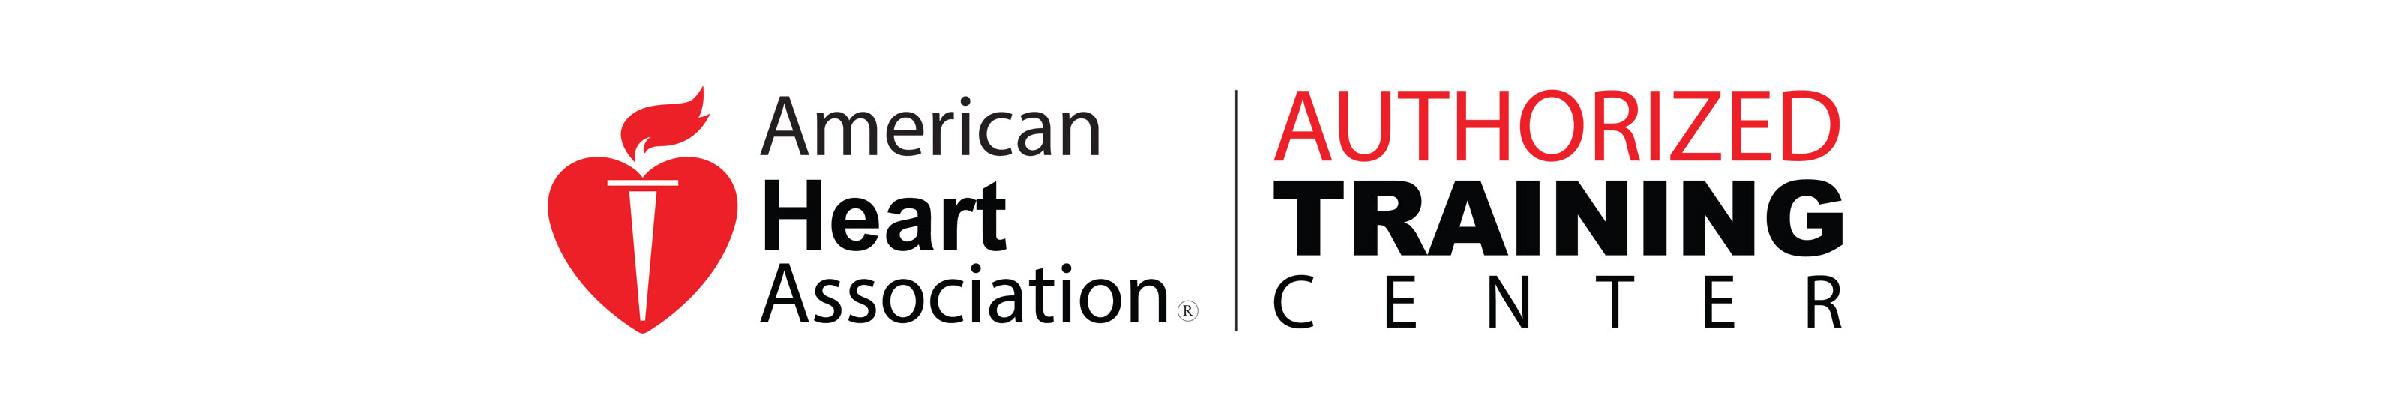 AHA_authorized_training_center.jpg